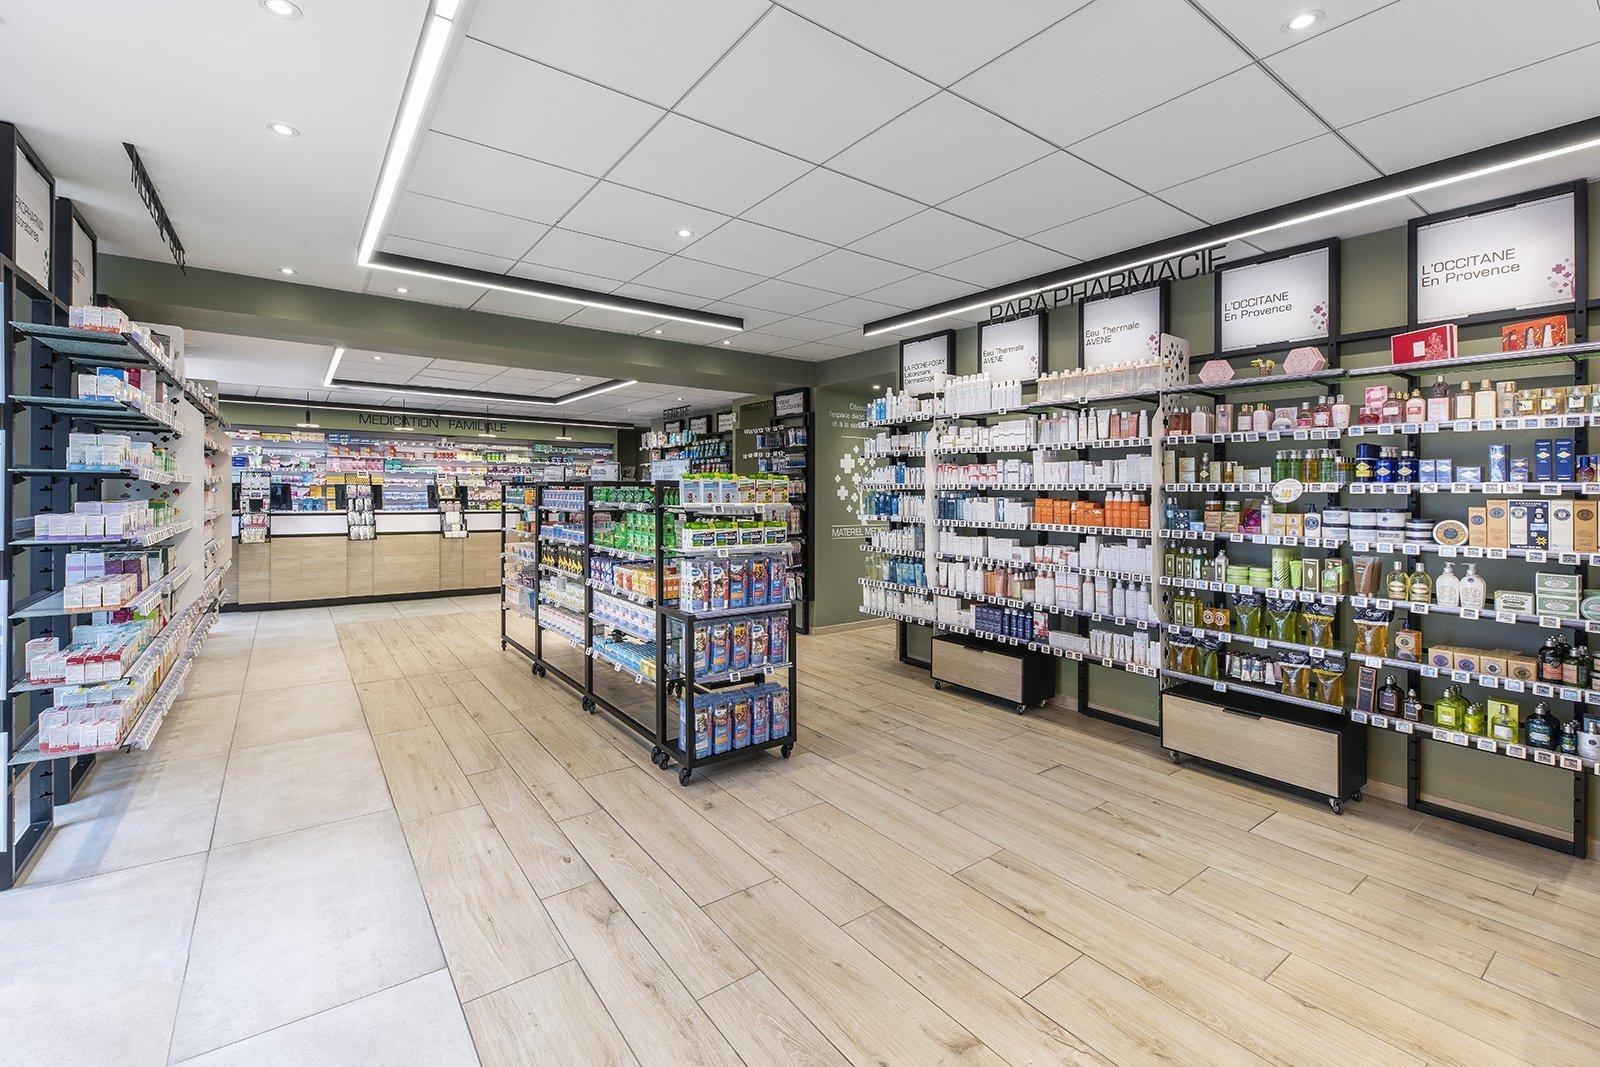 Pharmacie de l'Hotel de Ville: essere sorprendente